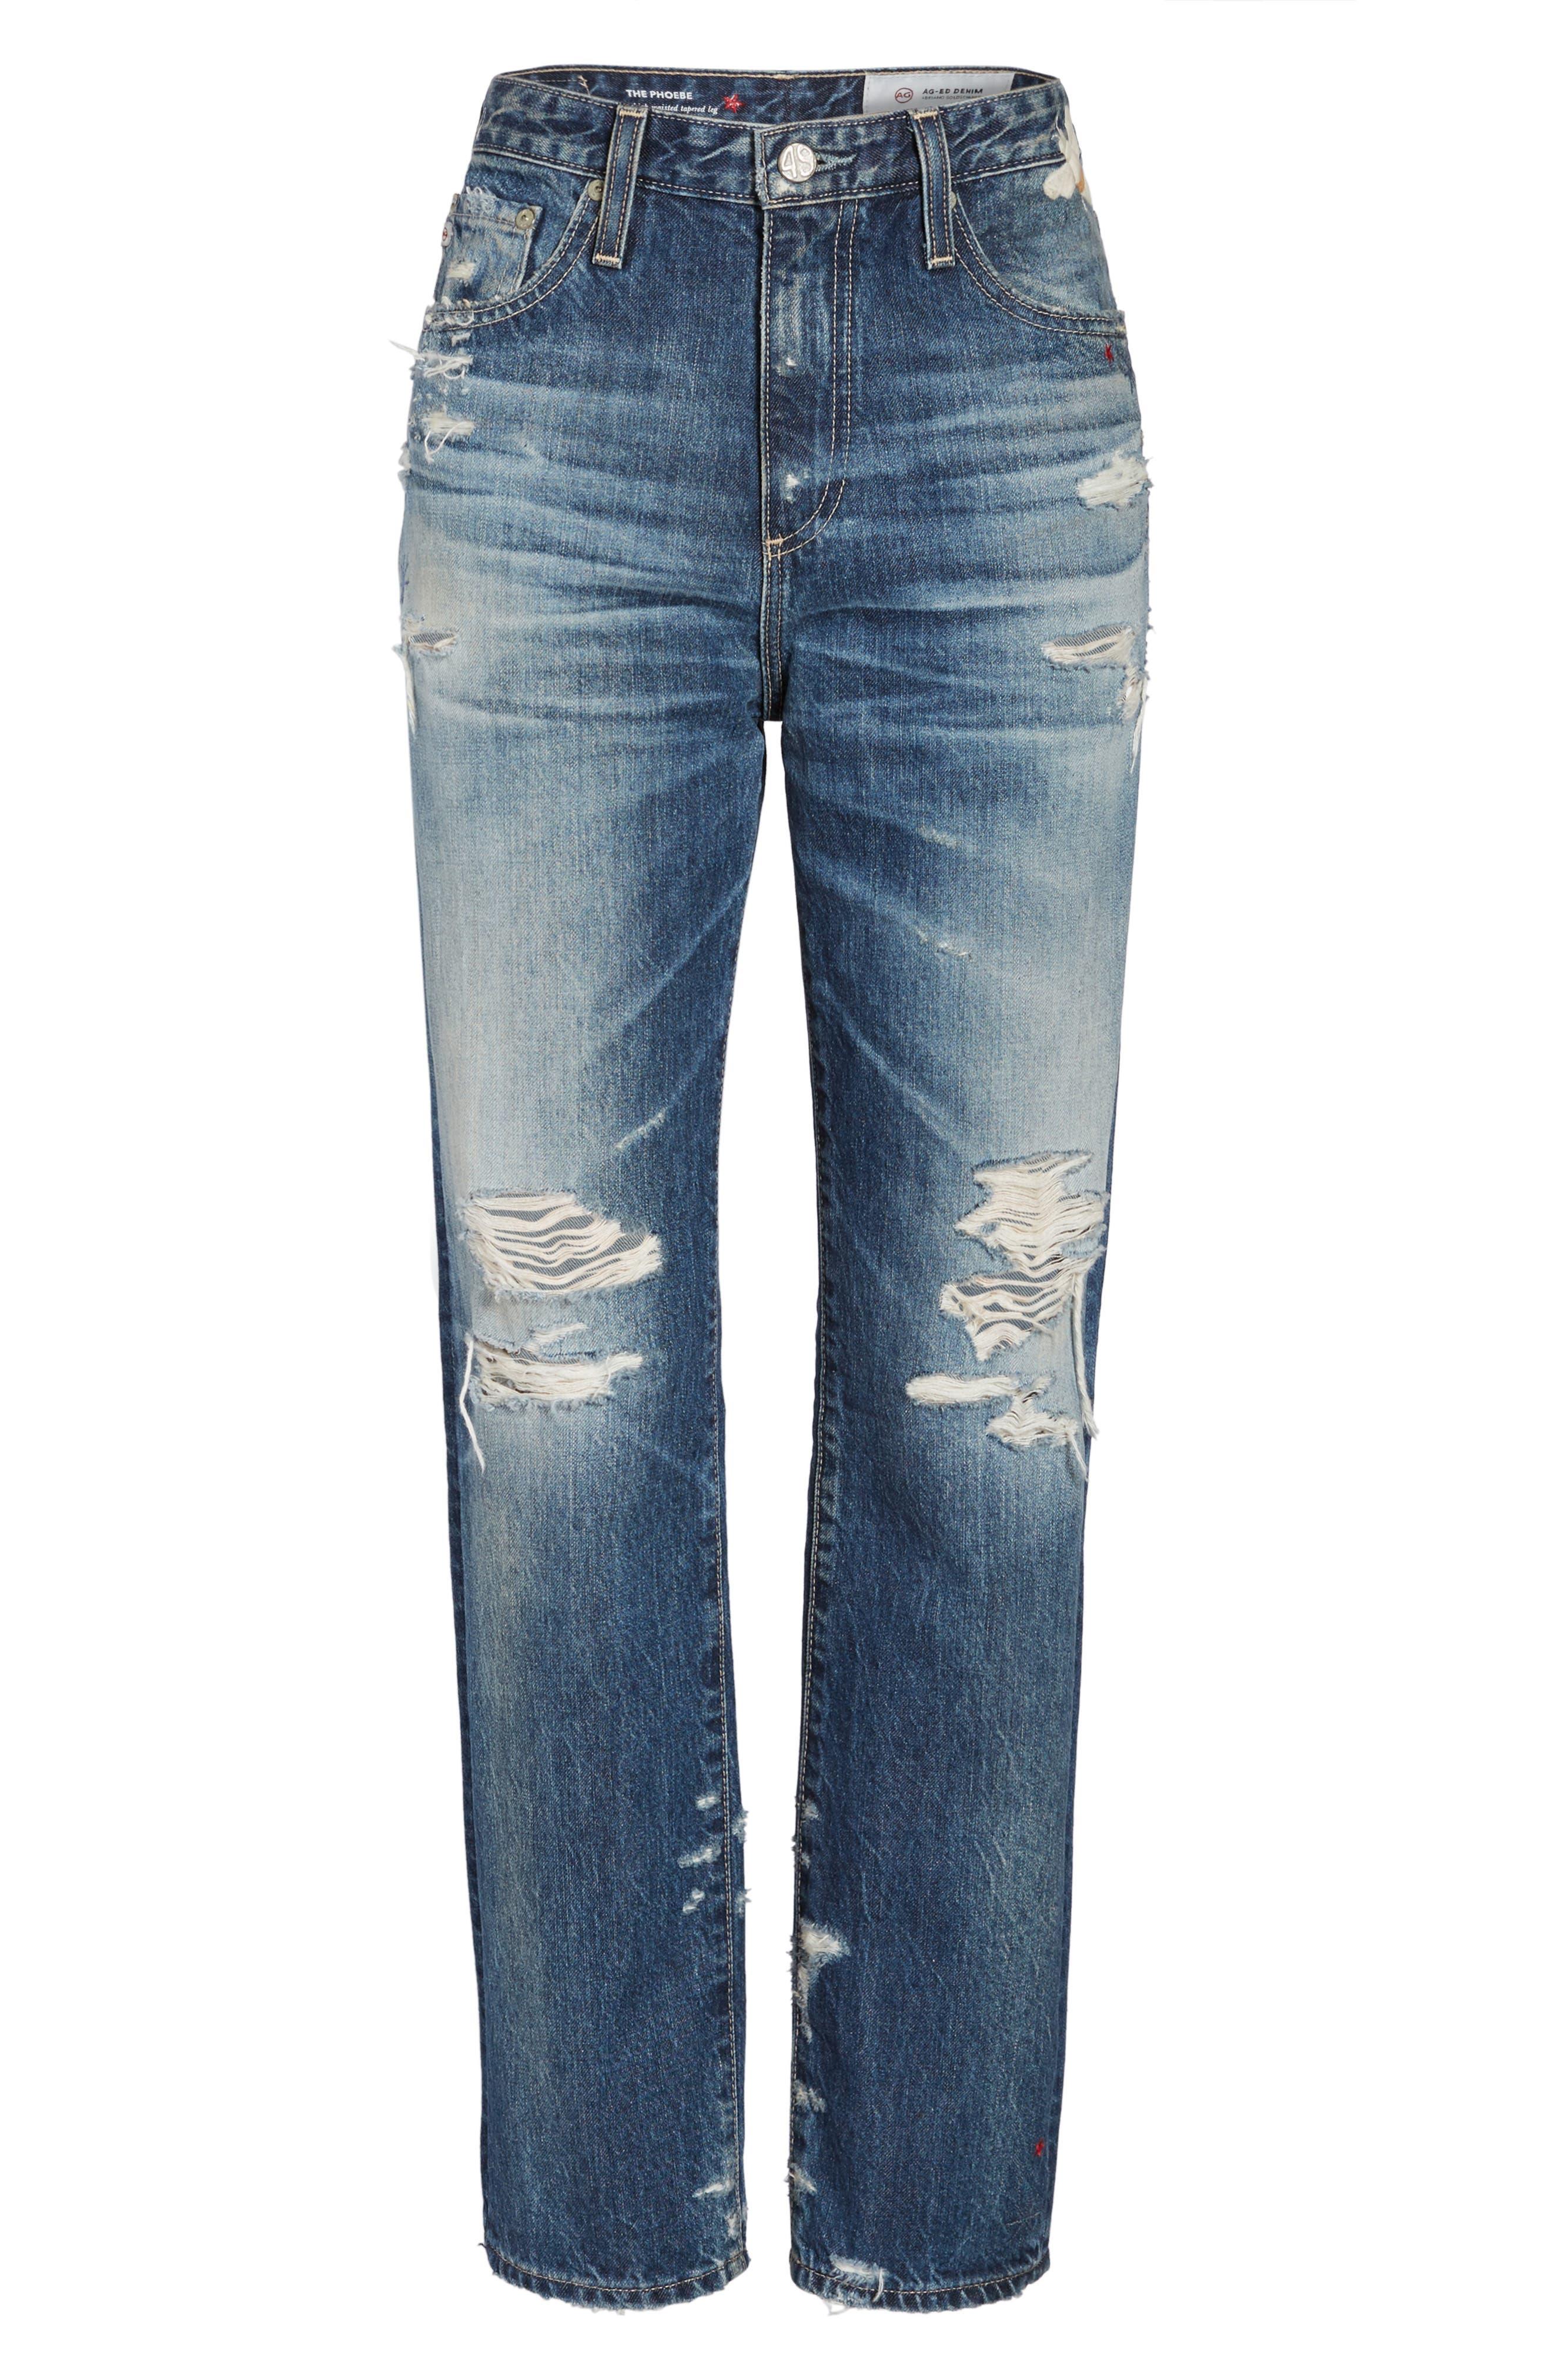 The Phoebe High Waist Straight Leg Jeans,                             Alternate thumbnail 6, color,                             23 Years Woven Dream